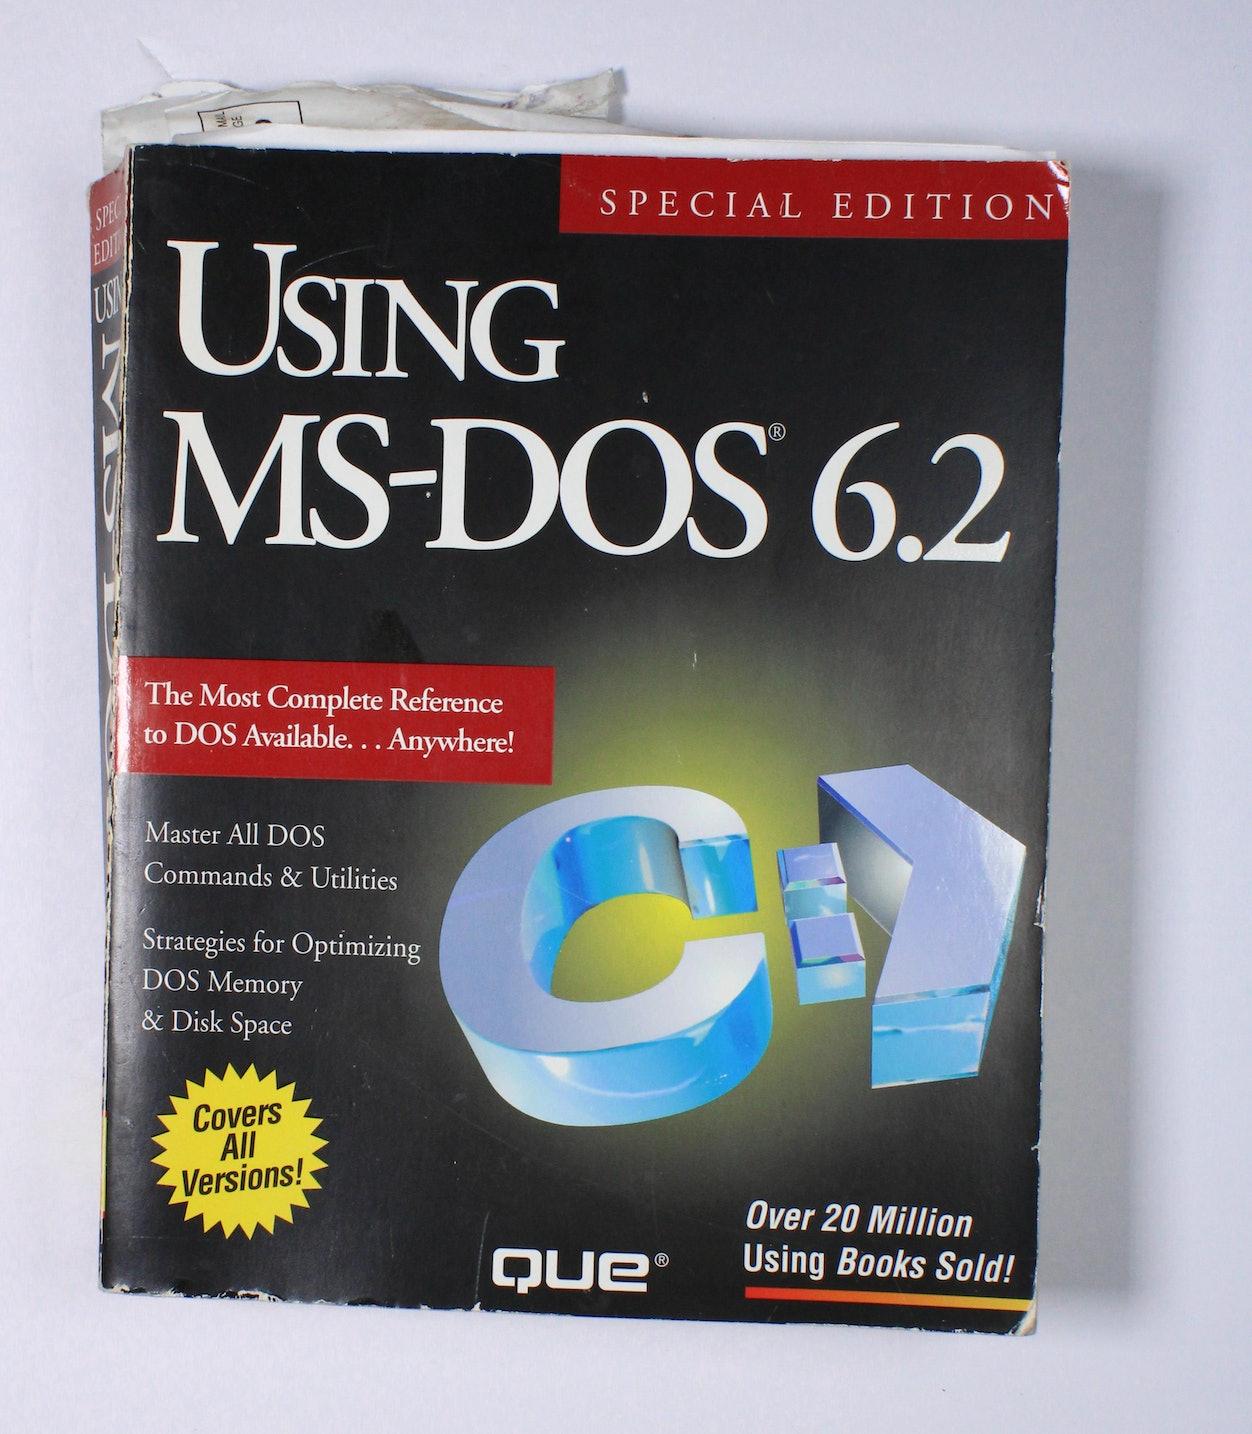 Using MS-DOC 6.2